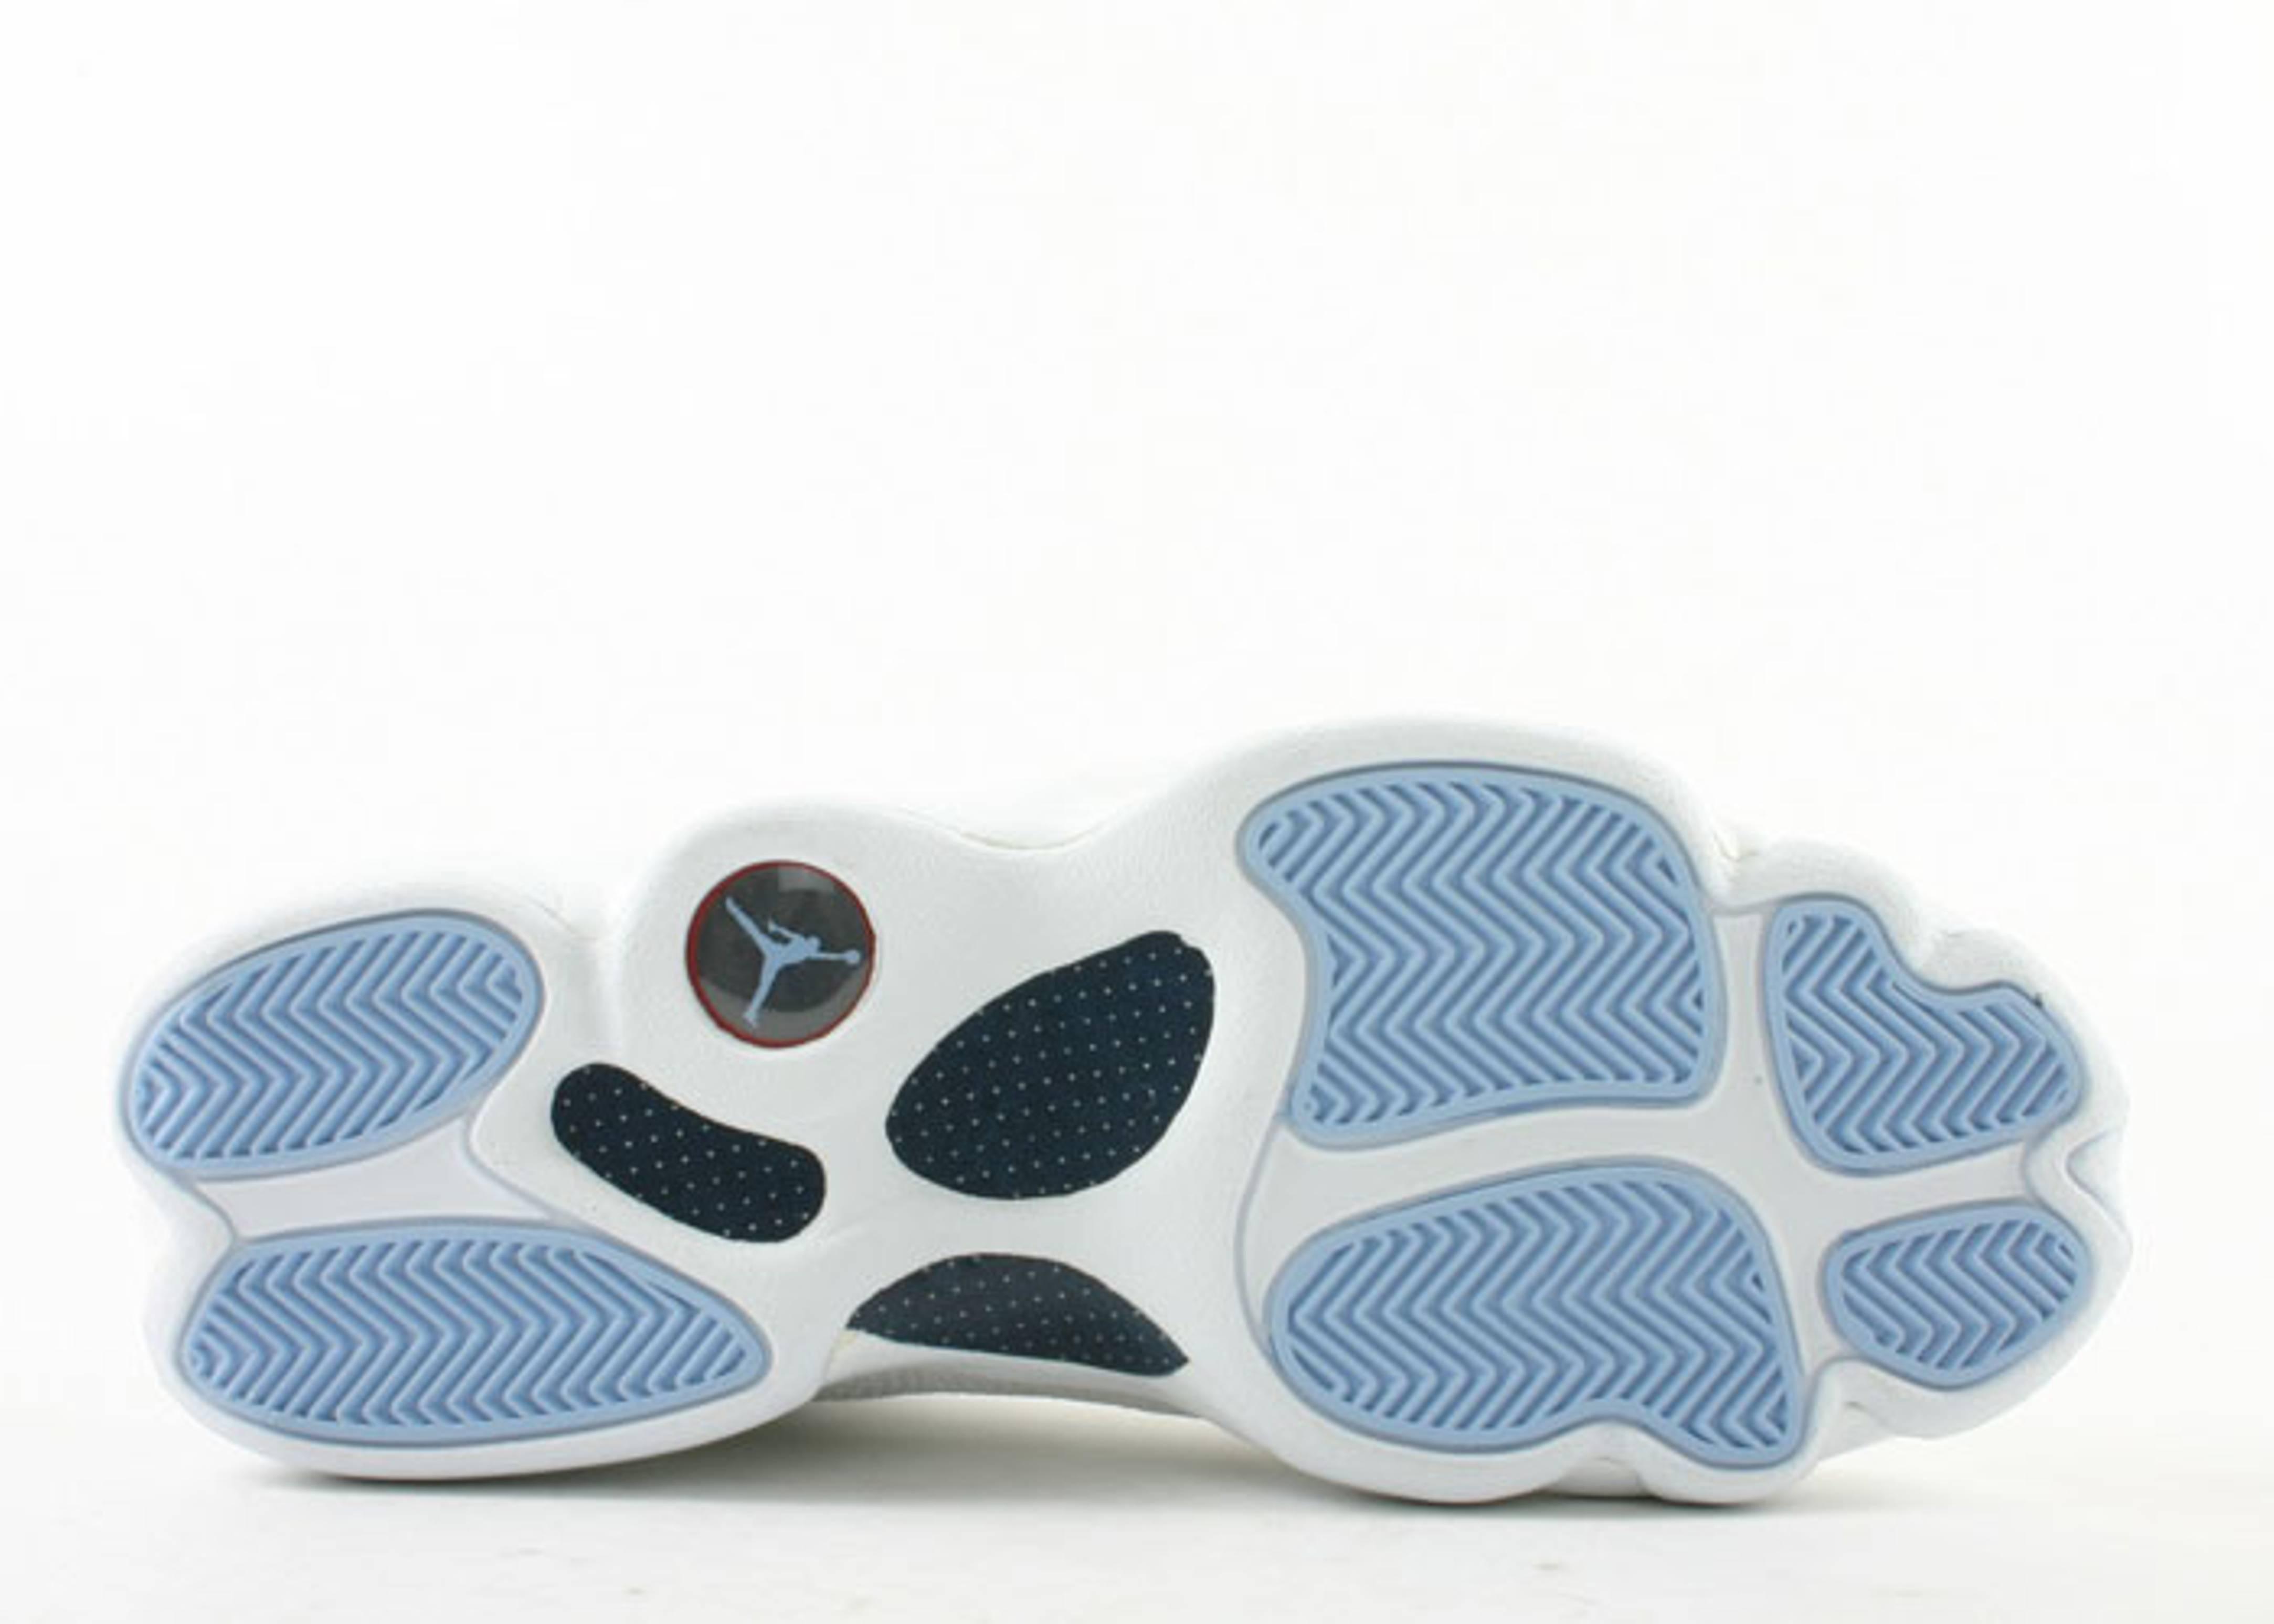 5d03a2913bc0 ... air jordan 13 retro low air jordan 310810 103 white metallic silver  midnight navy ice blue